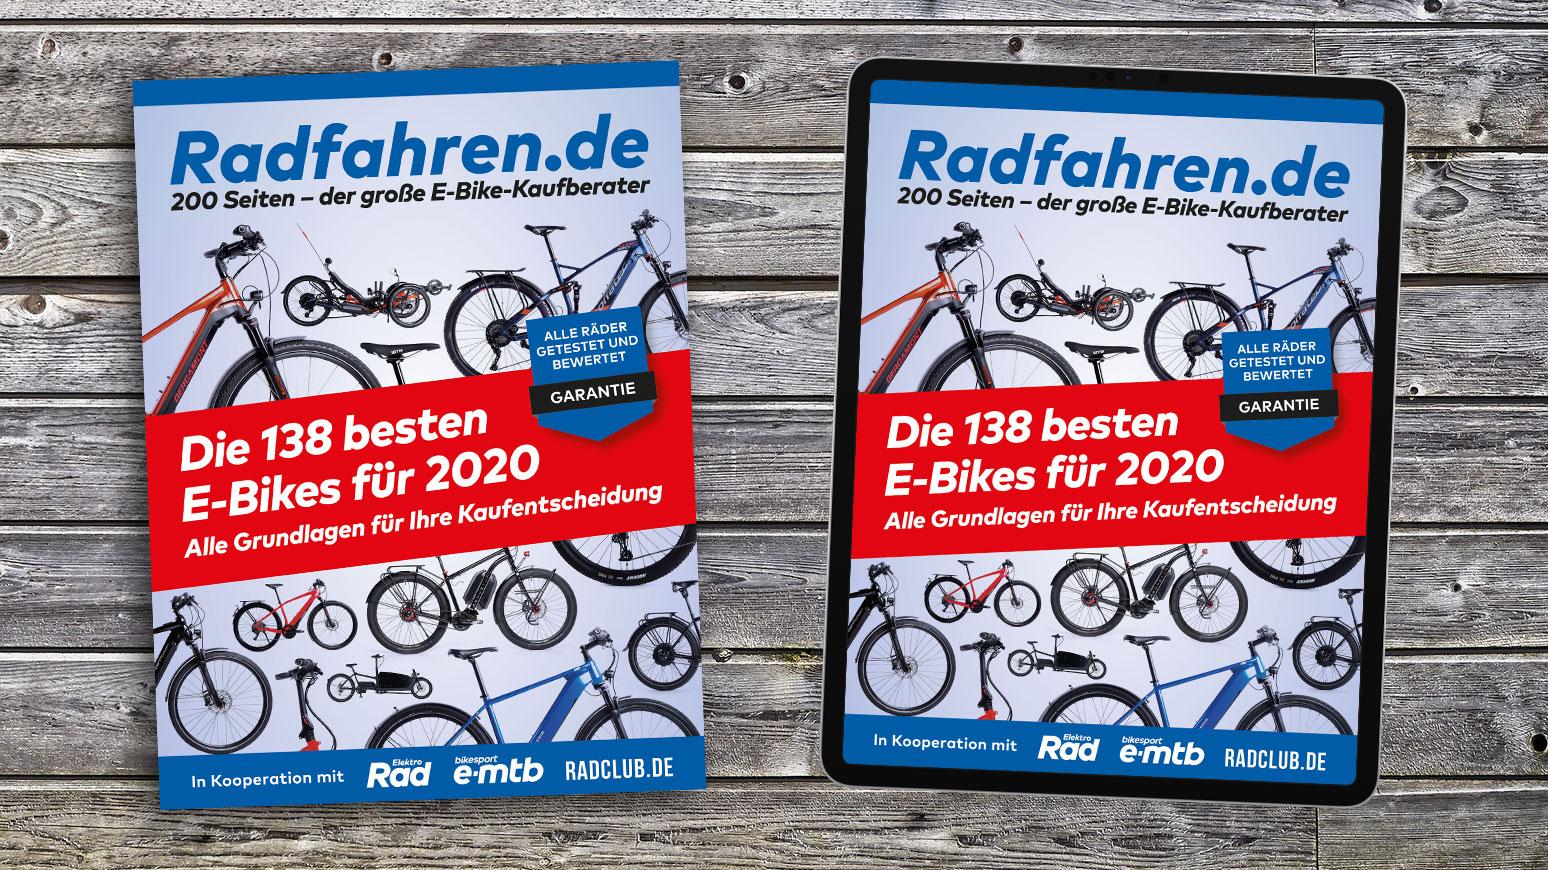 E-Bike-Kaufberater, Test, Sonderausgabe, E-Bike-Test